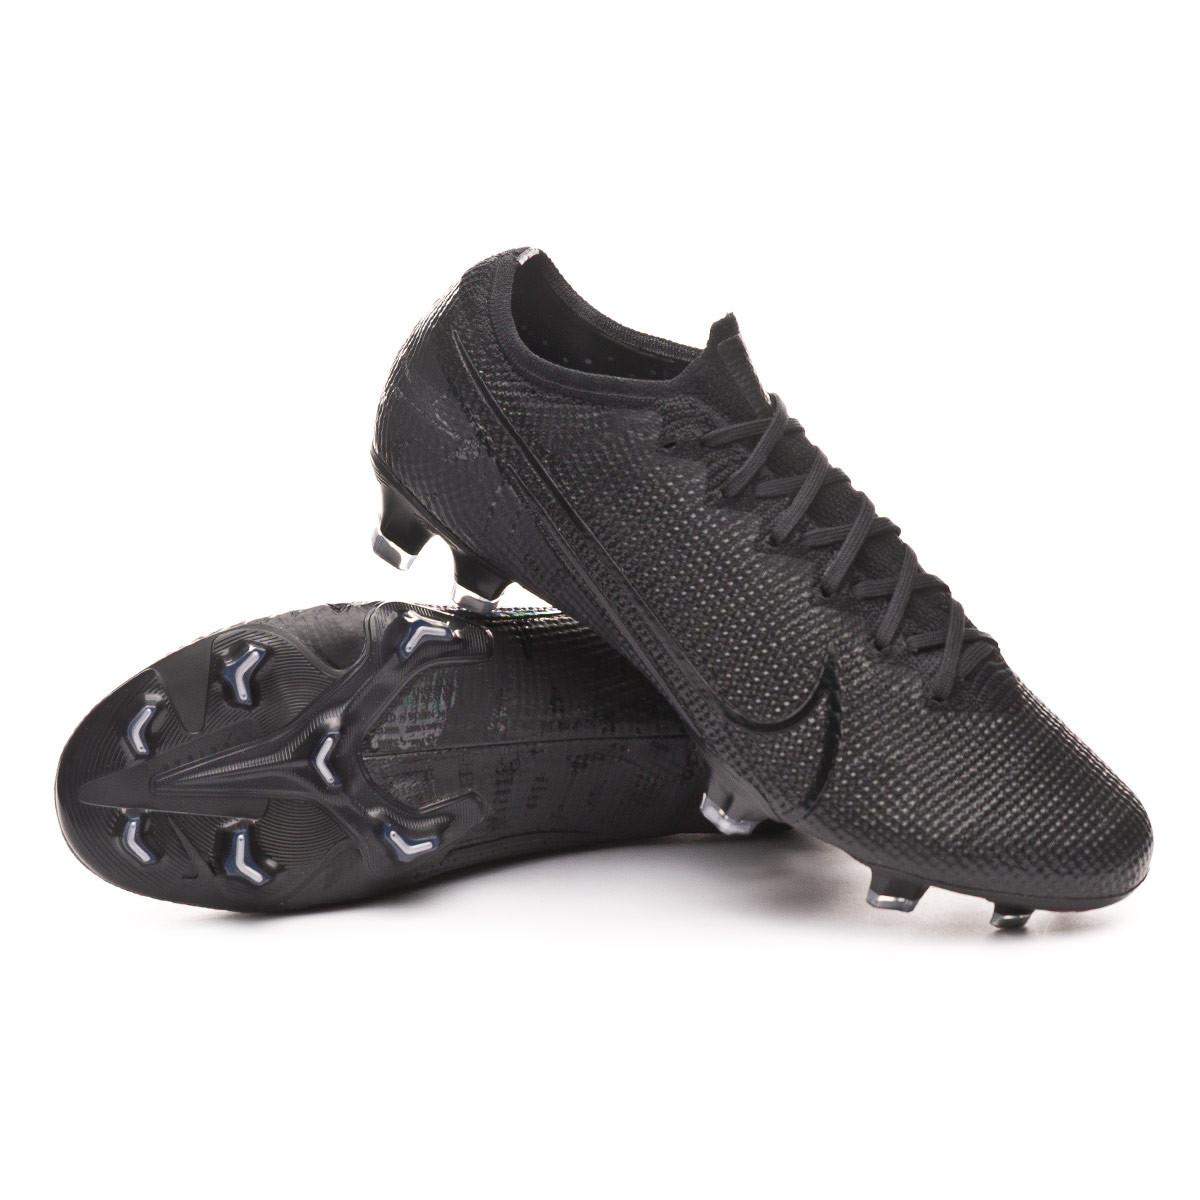 Suelto Ligadura Incontable  Football Boots Nike Mercurial Vapor XIII Elite FG Black-Matte  silver-Metallic cool grey - Football store Fútbol Emotion